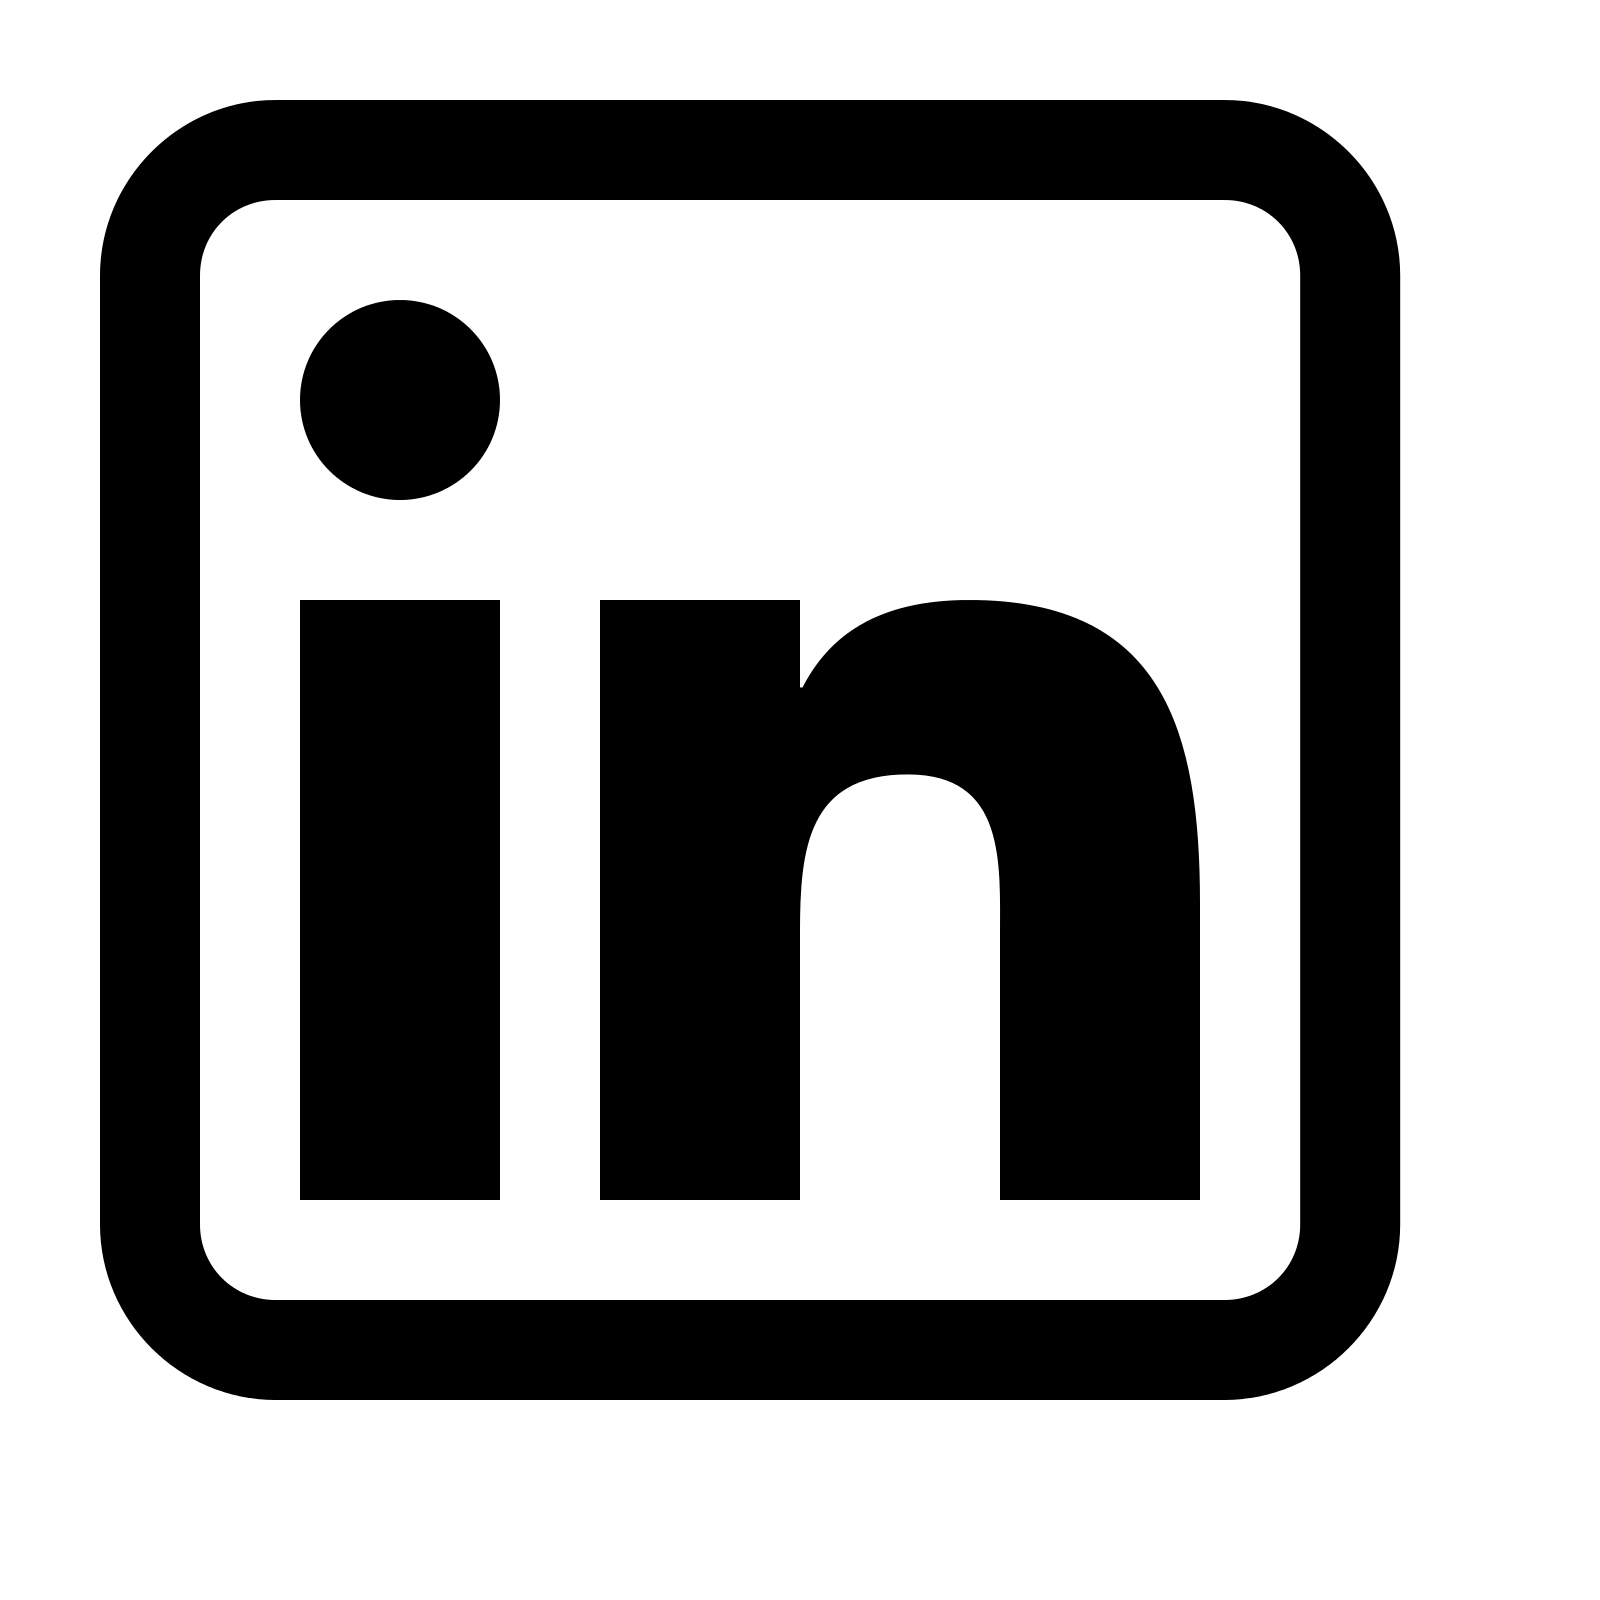 Linkedin Icon - Linkedin, Transparent background PNG HD thumbnail